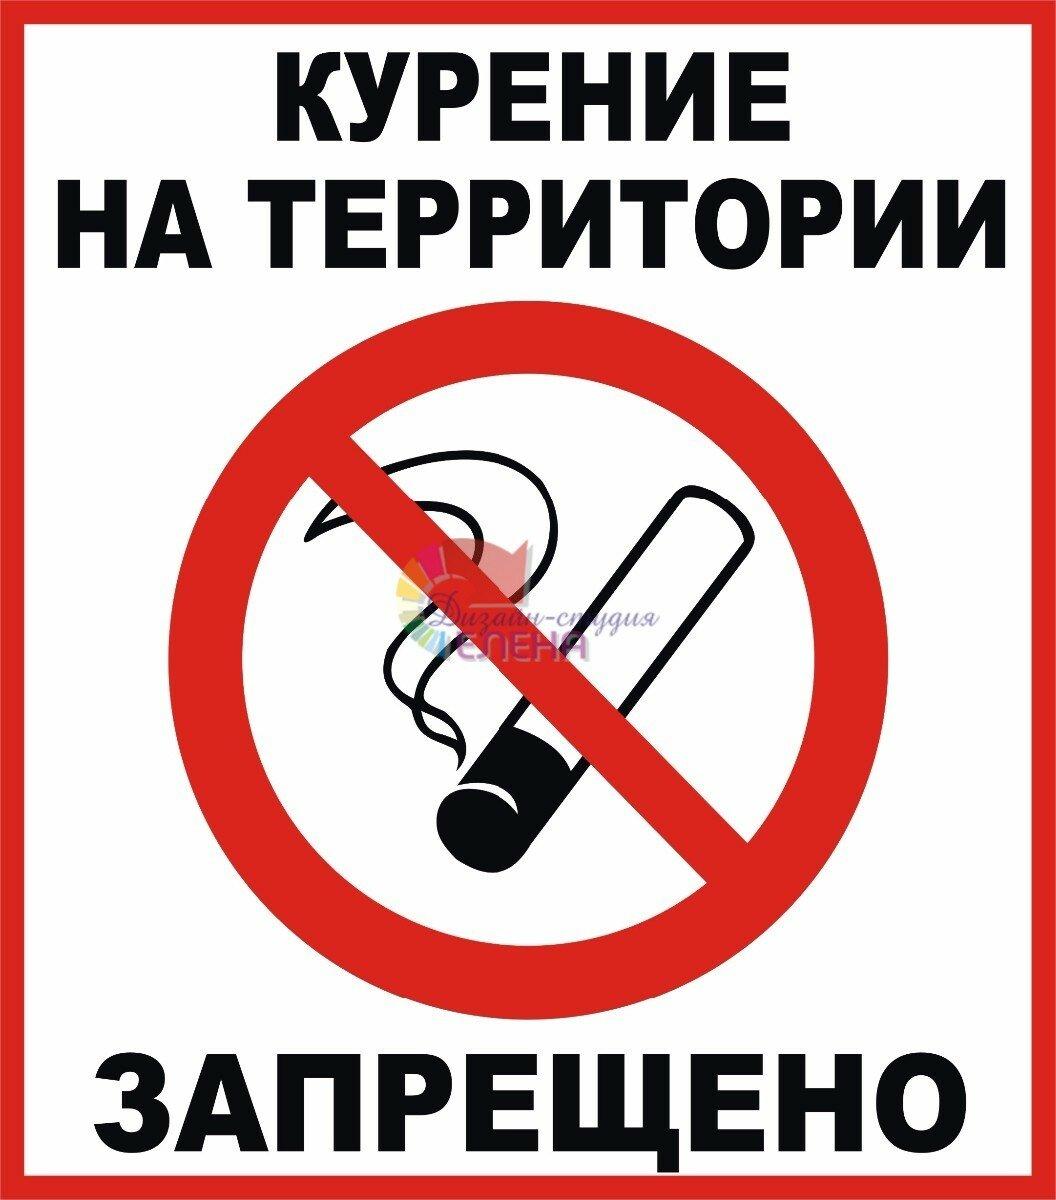 Курение запрещено штраф картинка